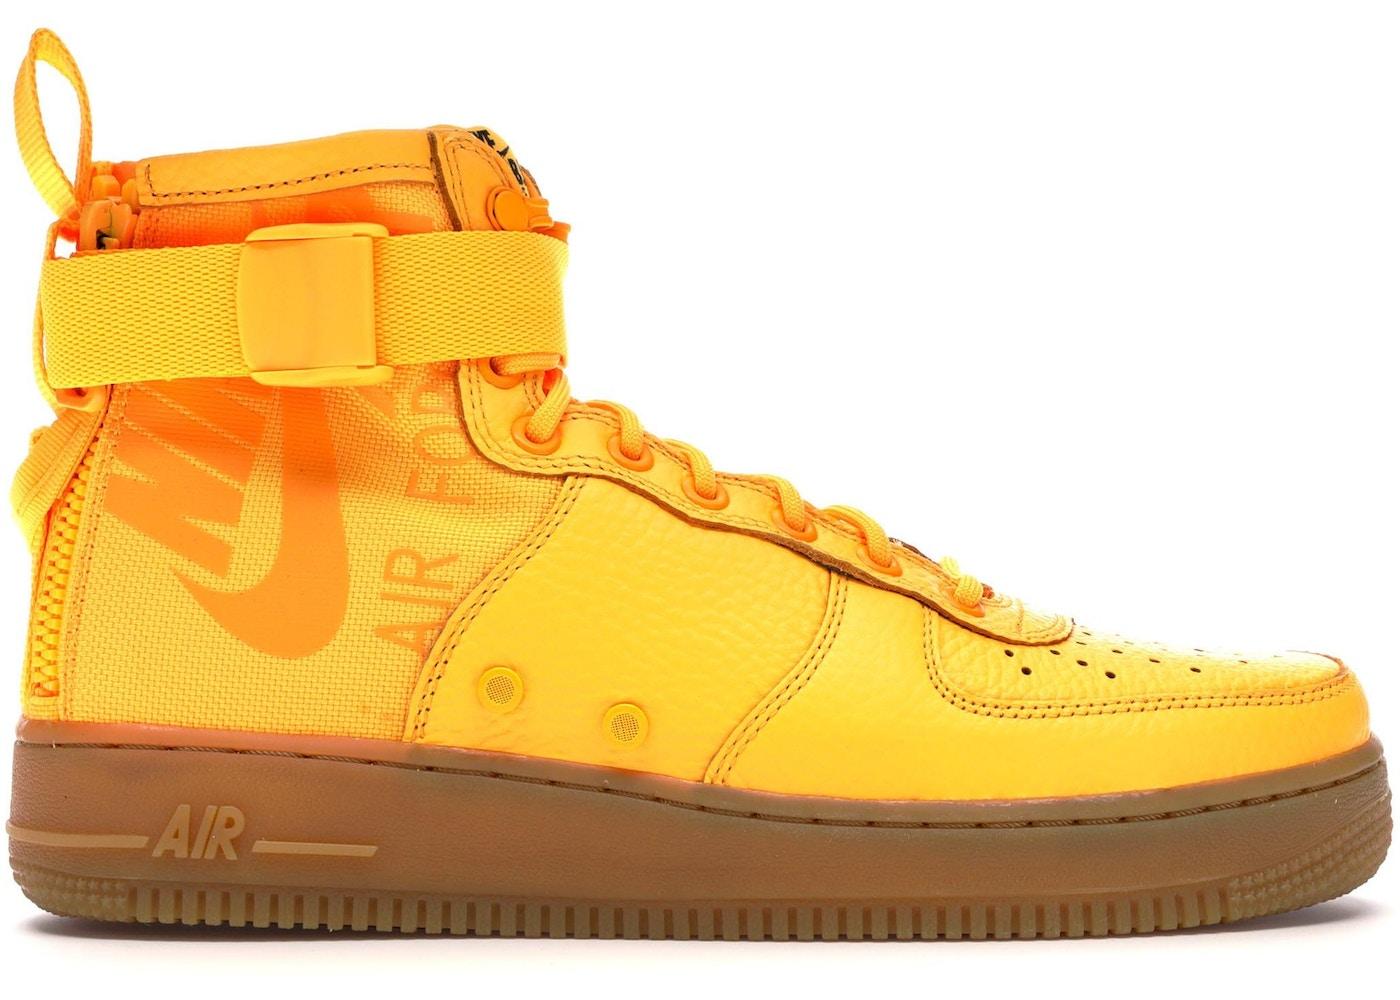 separation shoes 00ecd 451fd SF Air Force 1 Mid Odell Beckham Jr.